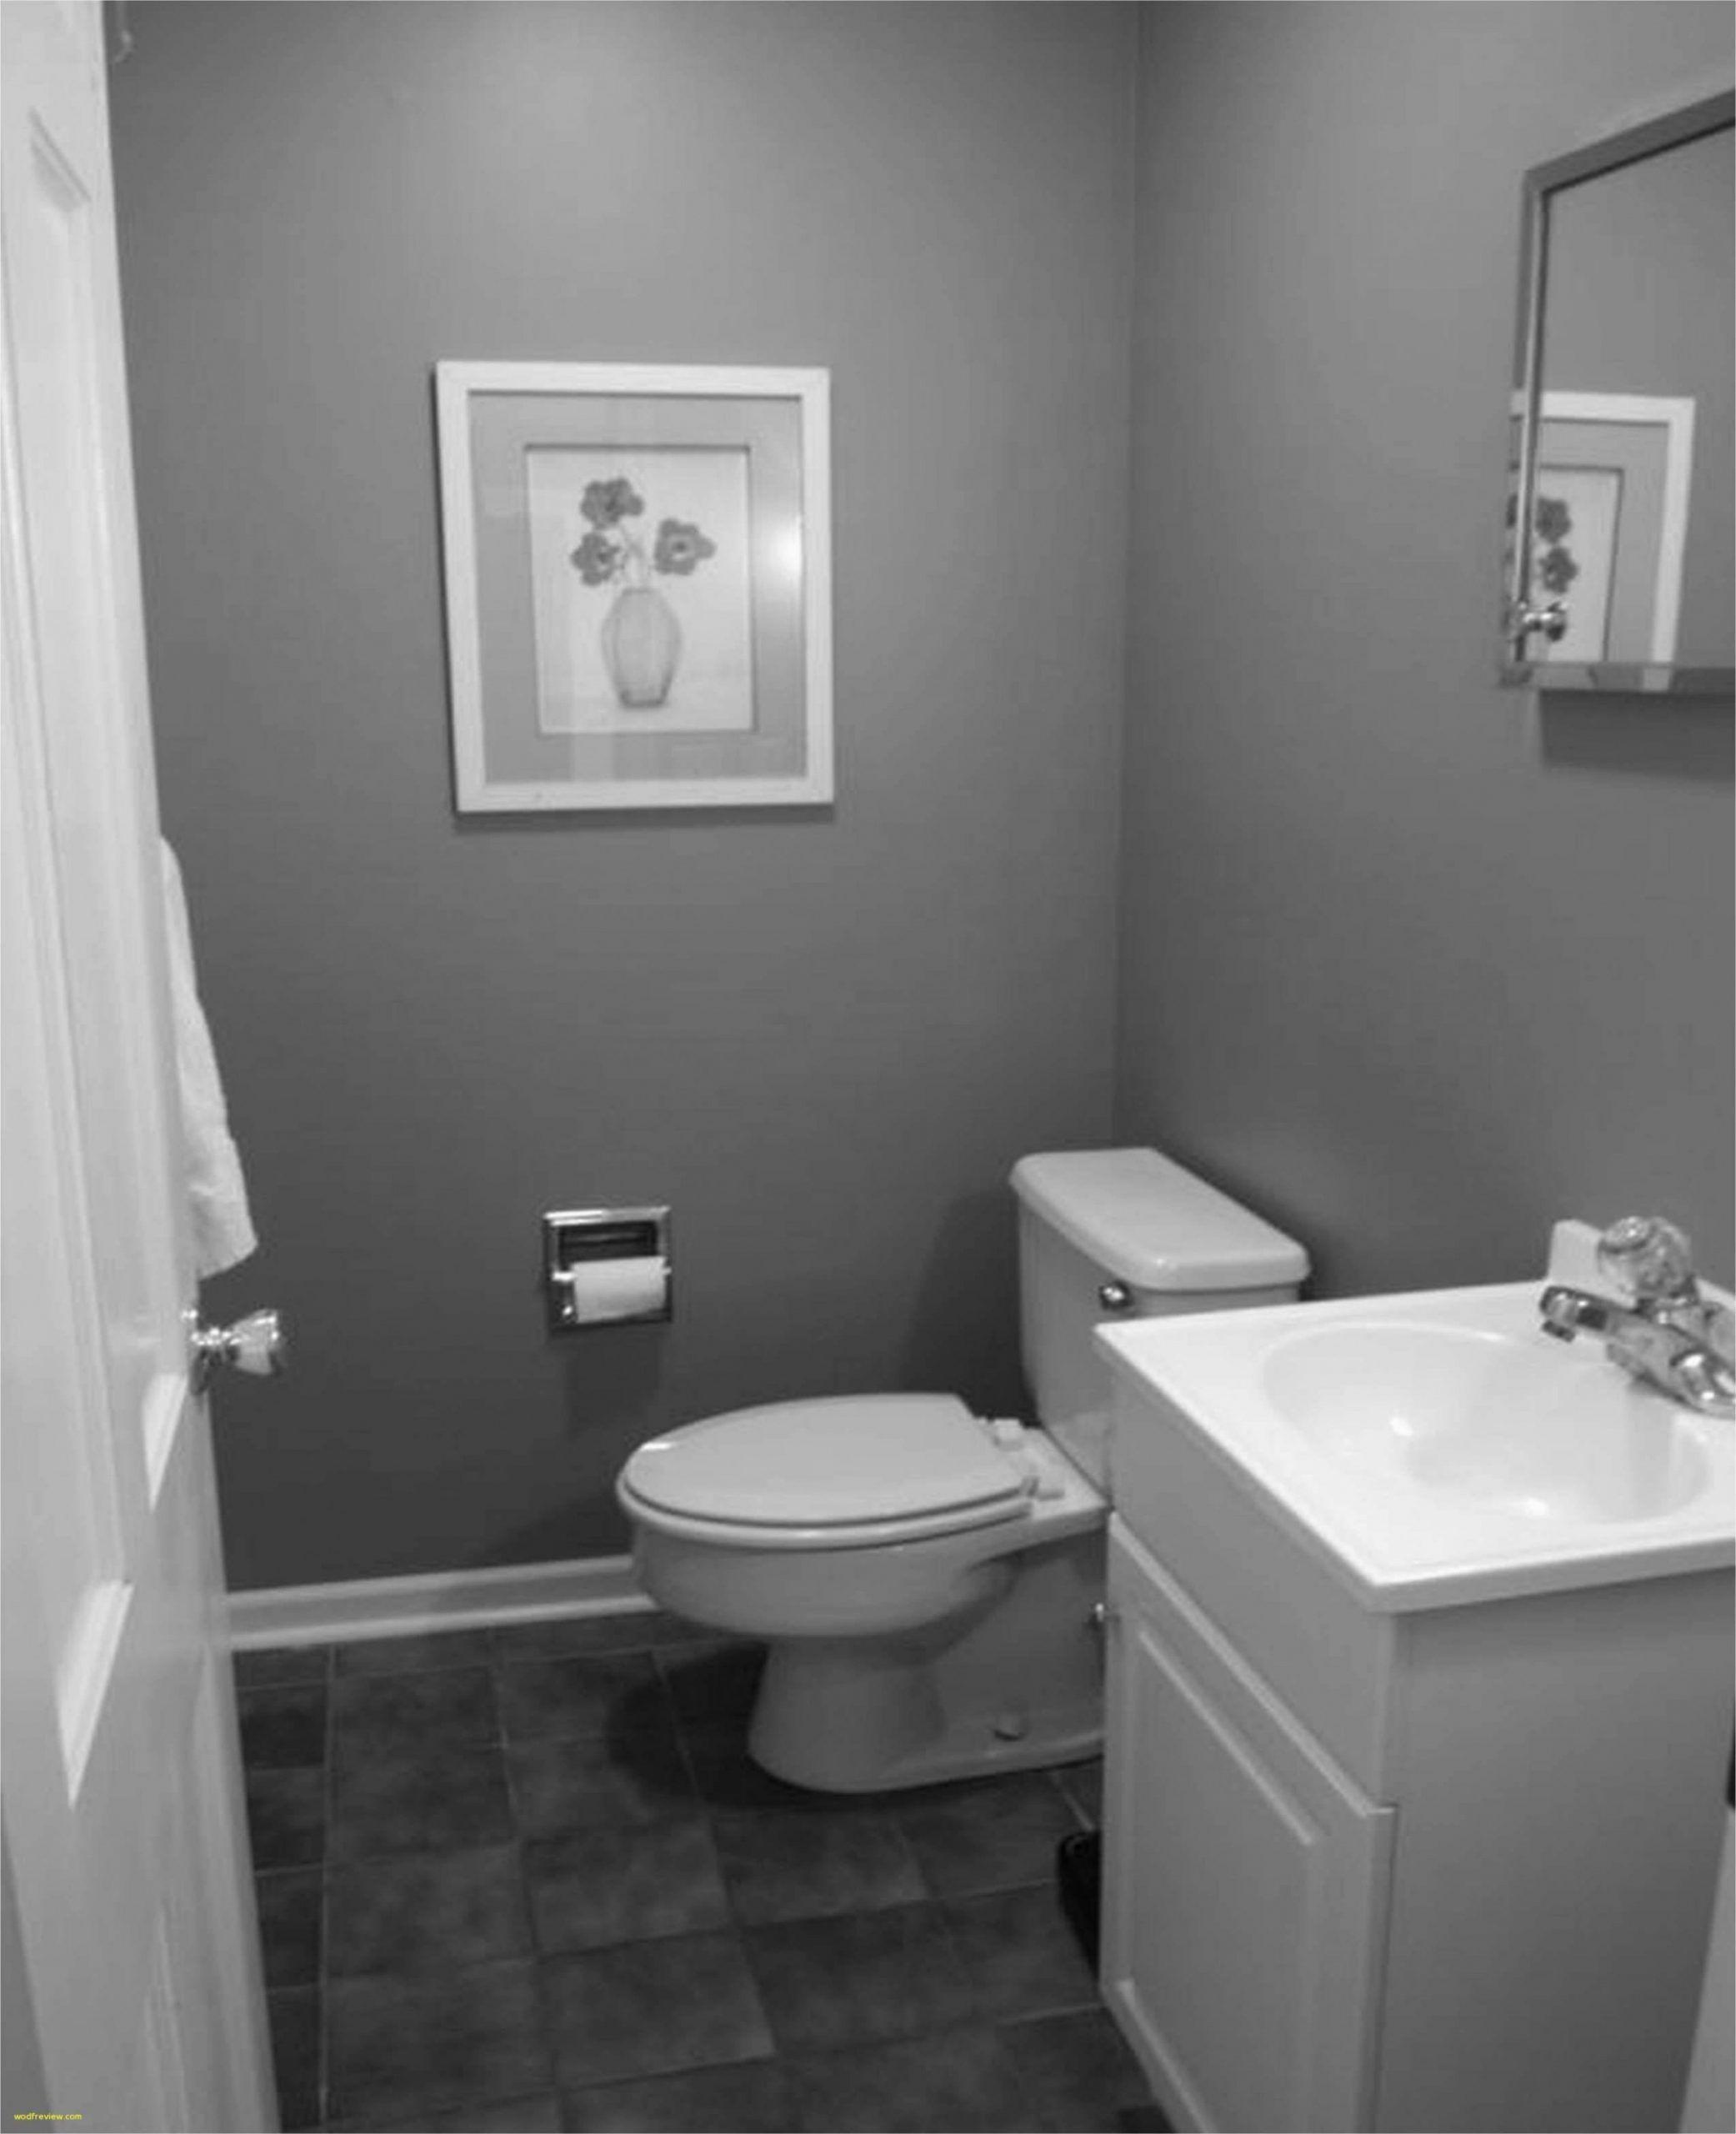 Vintage Bathroom Paint Color Ideas Desain Kamar Mandi Modern Renovasi Kamar Mandi Kecil Kamar Mandi Modern Bathroom paint design ideas